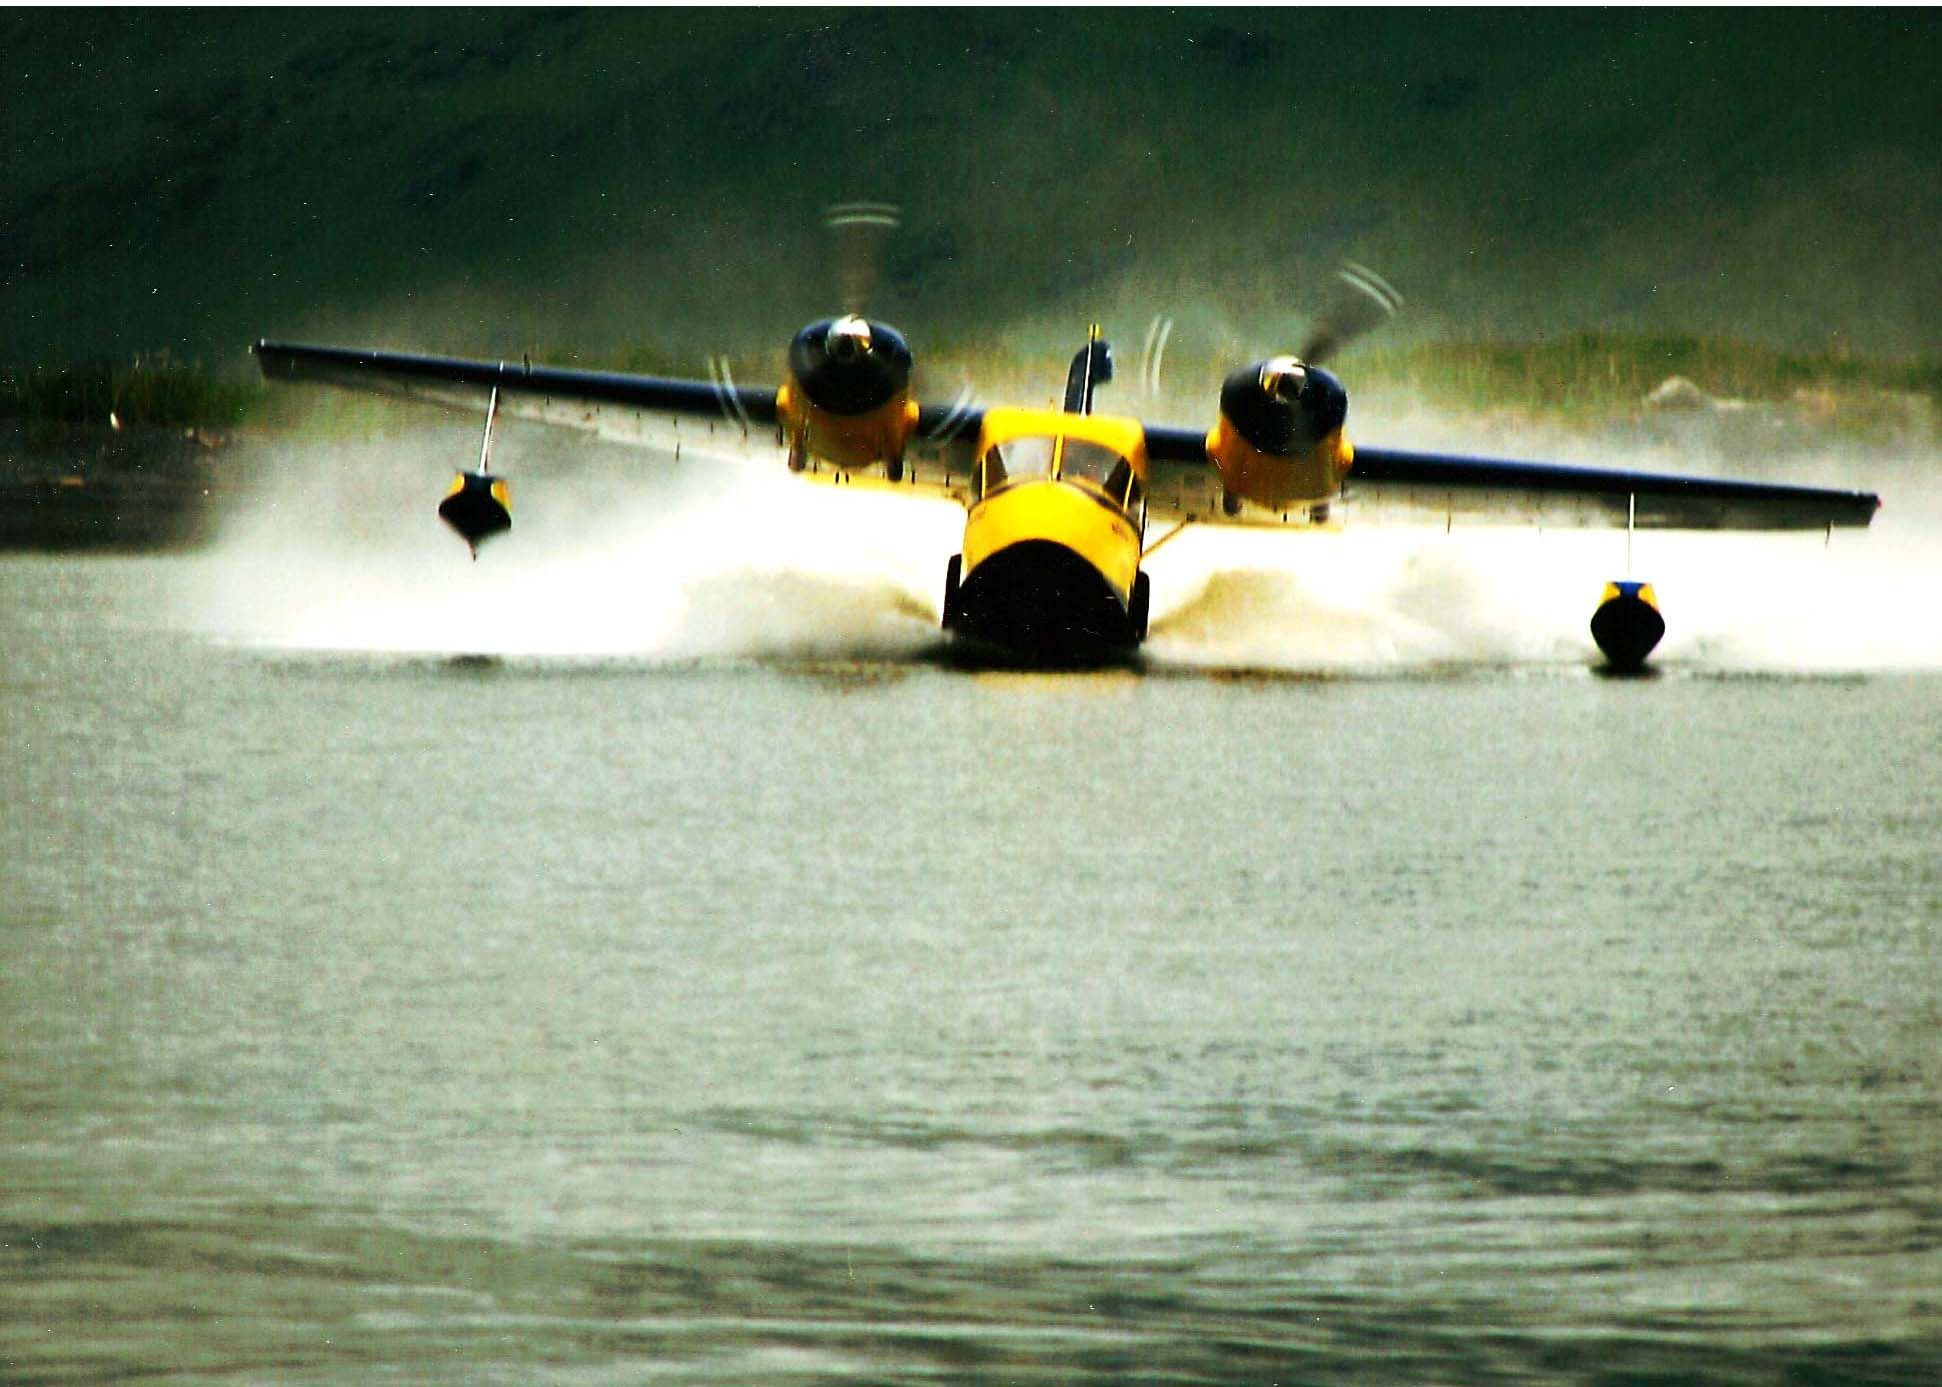 A 1947 Grumman Widgeon flown around Kodiak Island, Alaska